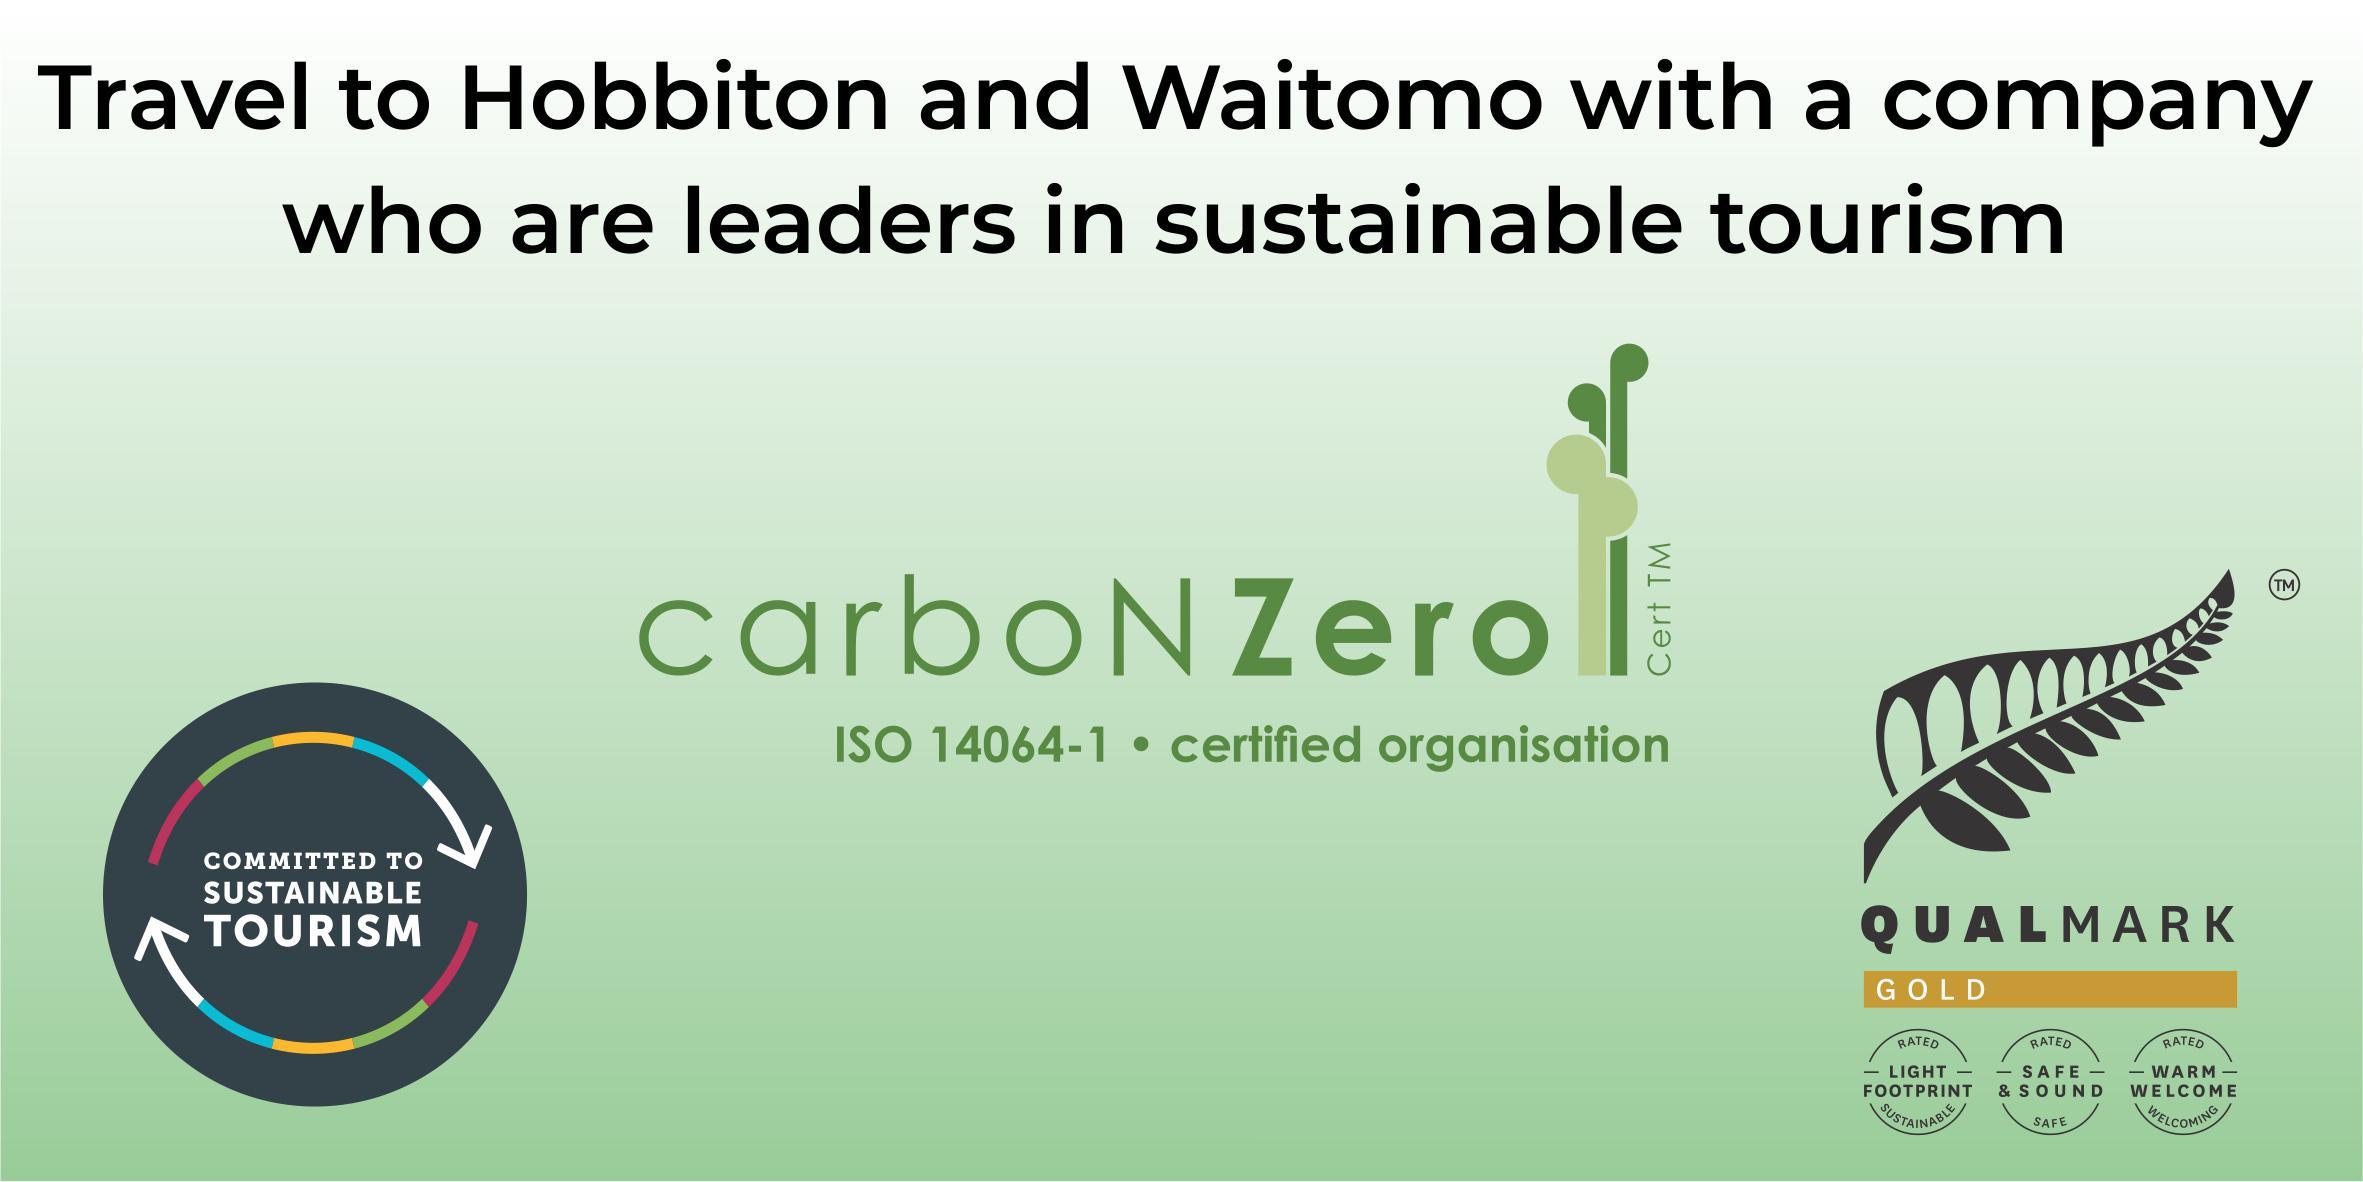 Hobbiton and Waitomo sustainable tourism company